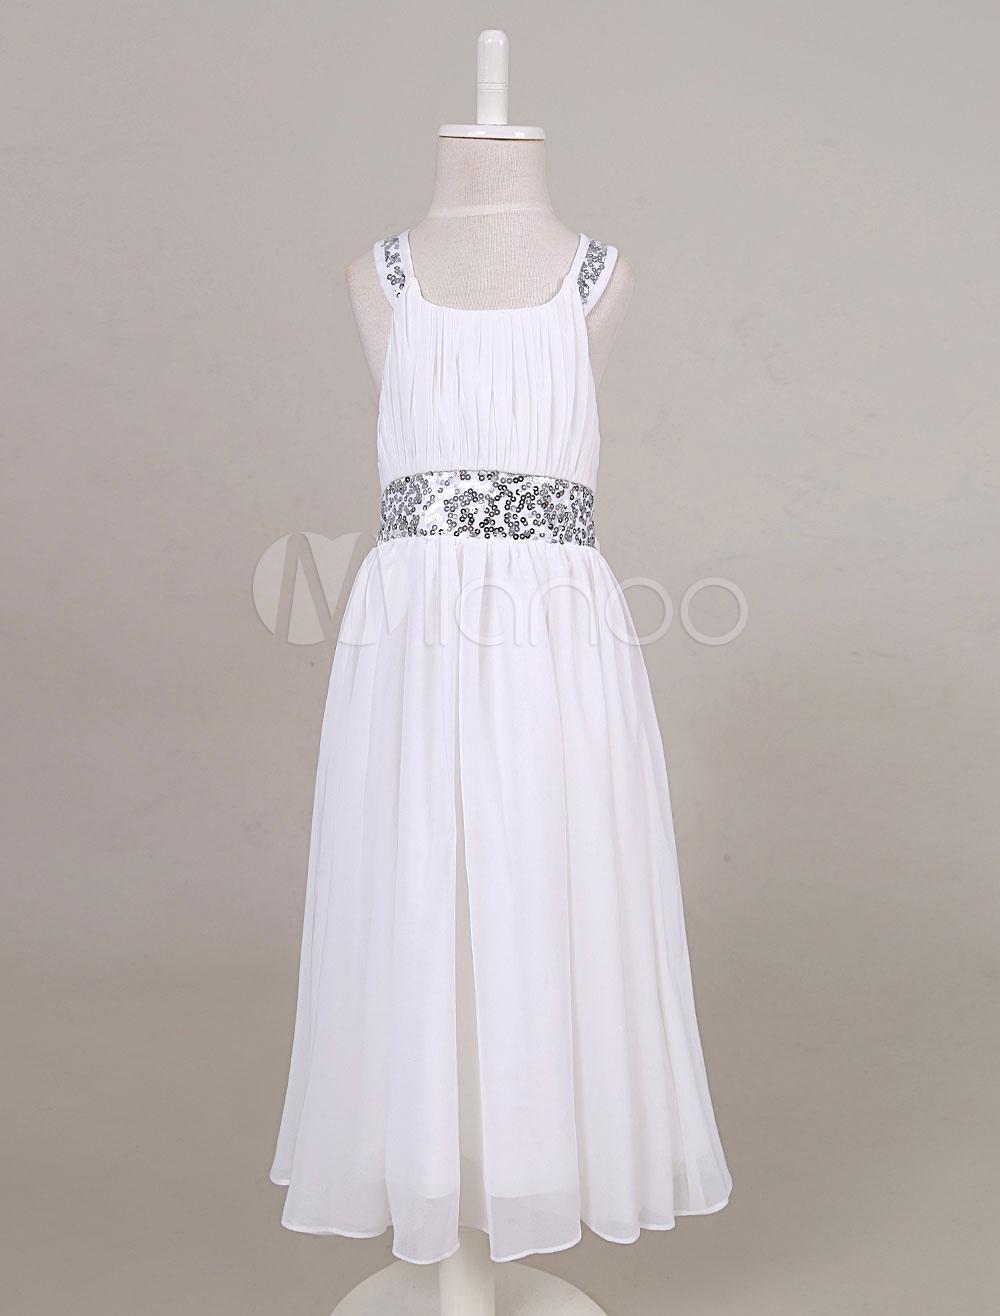 Chiffon Flower Girl Dress Sequin Back Criss-cross Tea-length Toddler's Dinner Dress